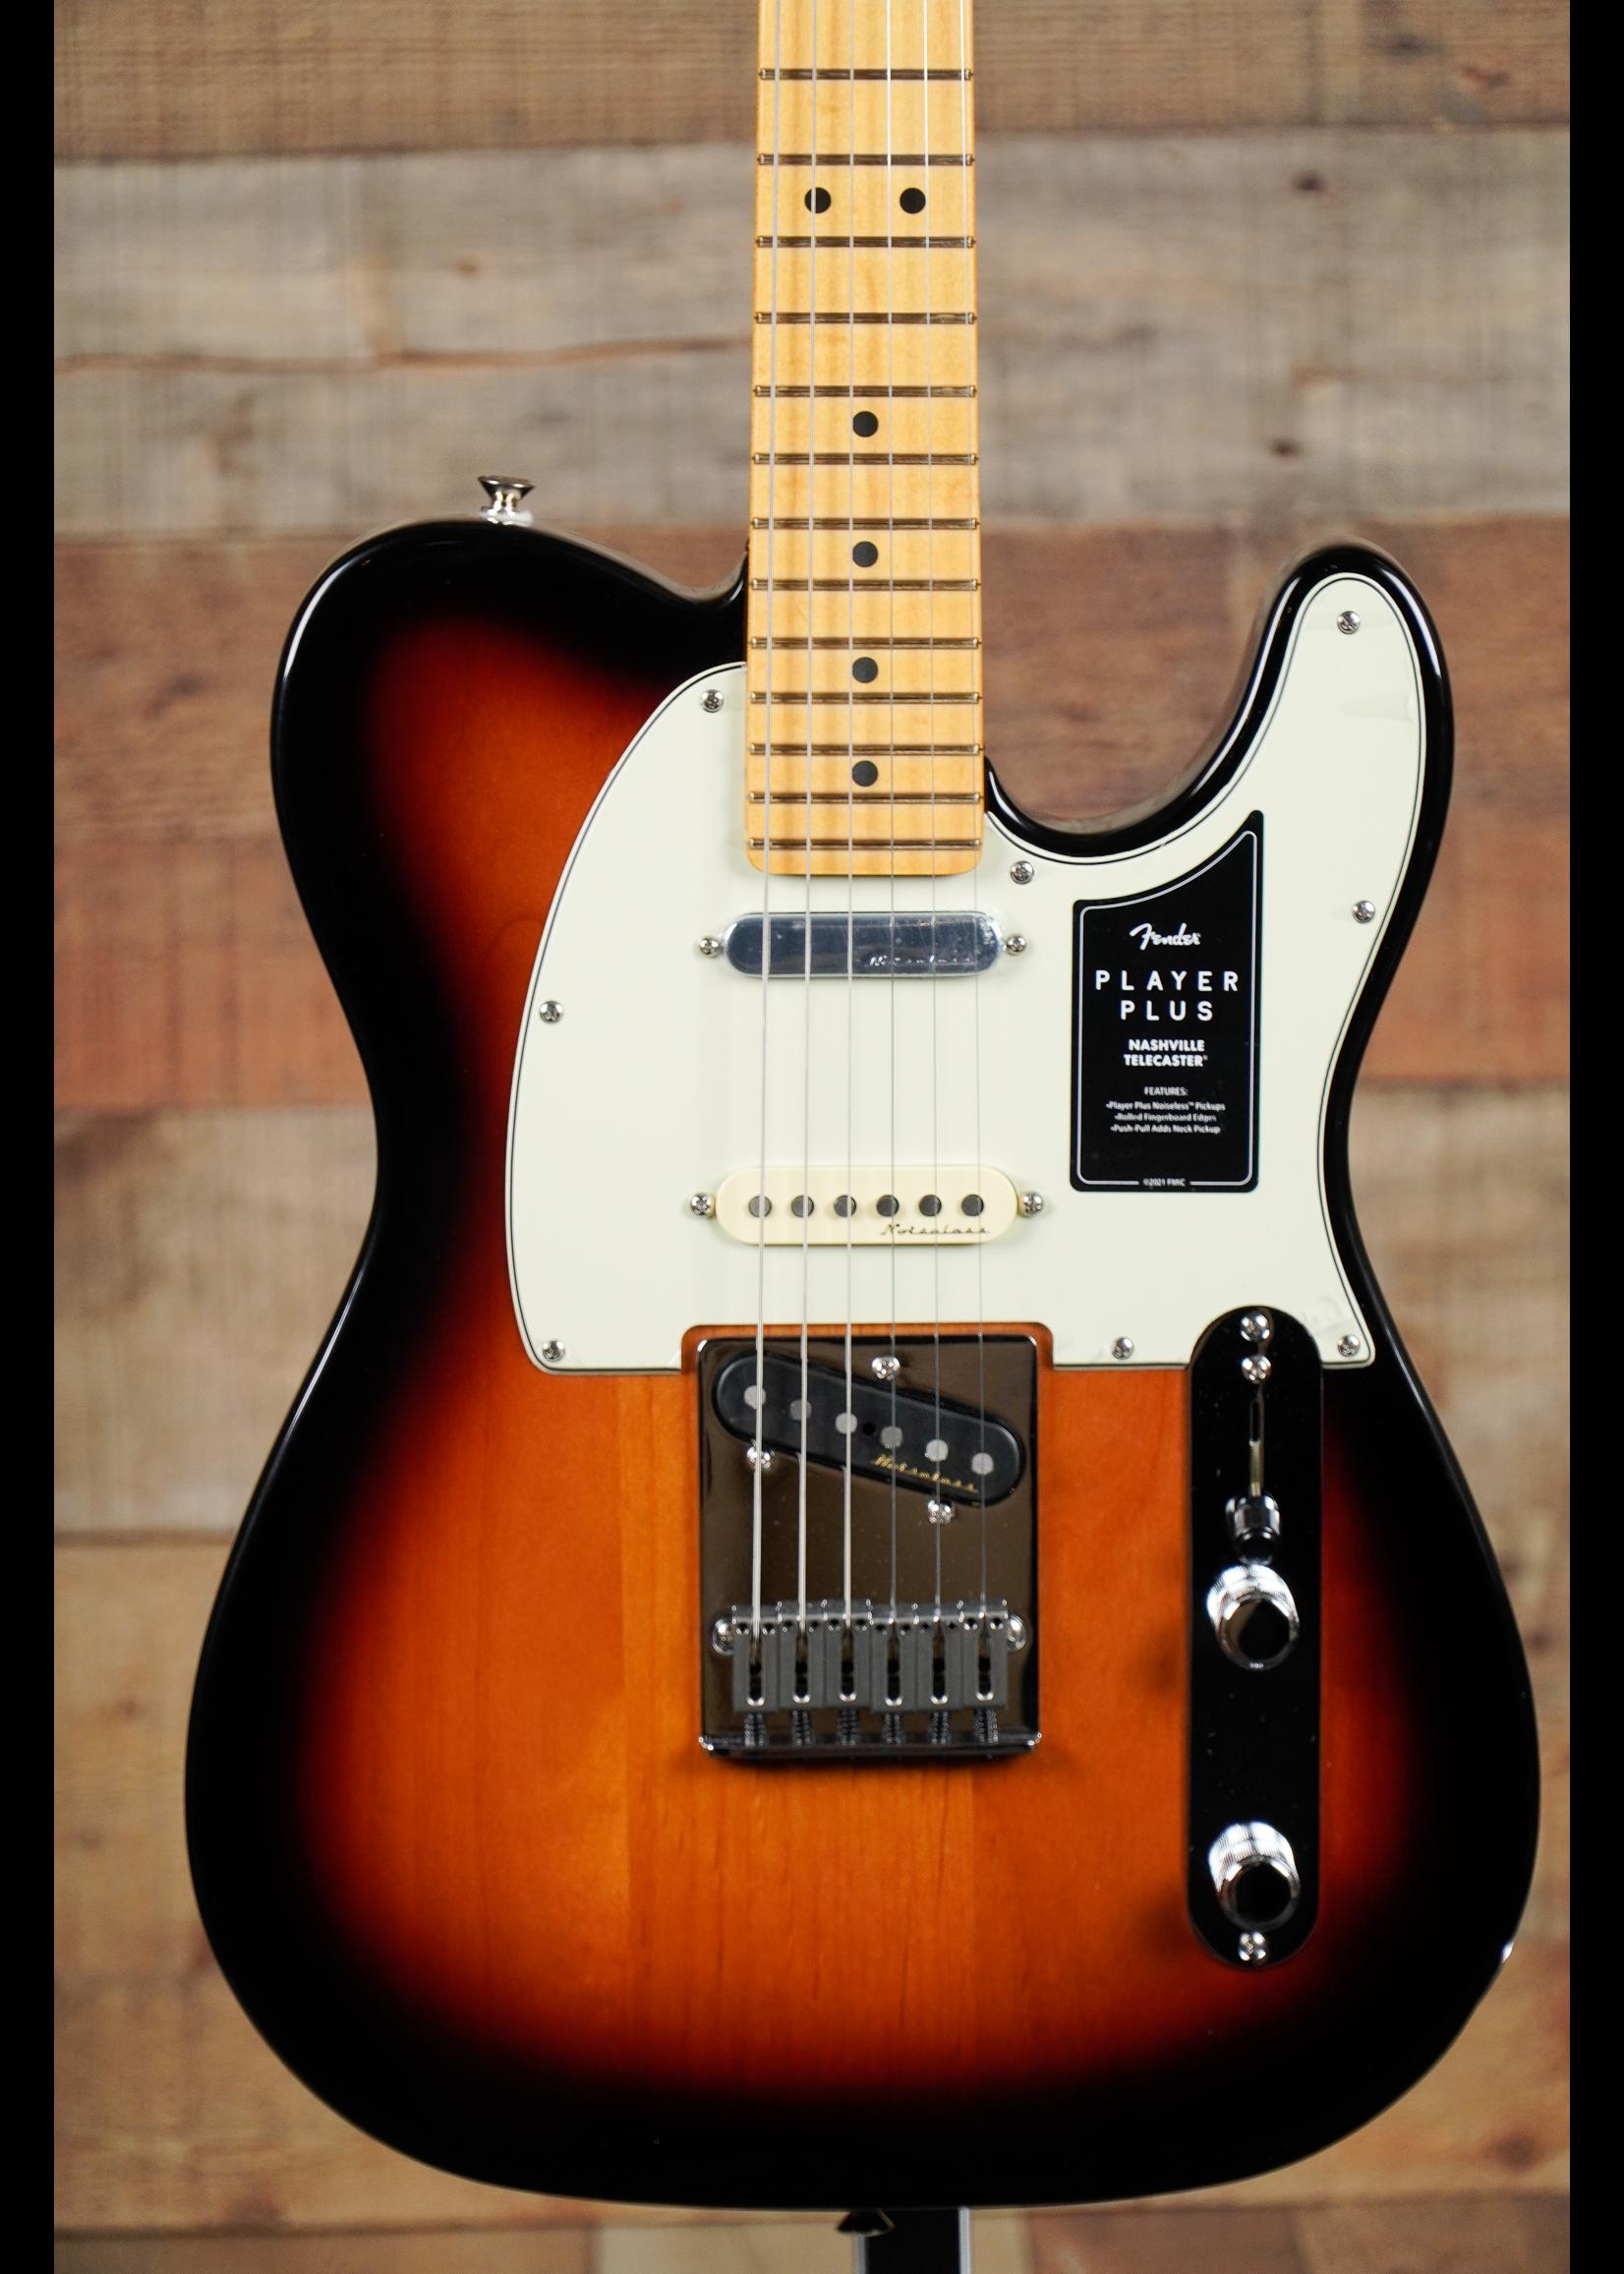 Fender Fender Player Plus Nashville Telecaster®, Maple Fingerboard, 3-Color Sunburst